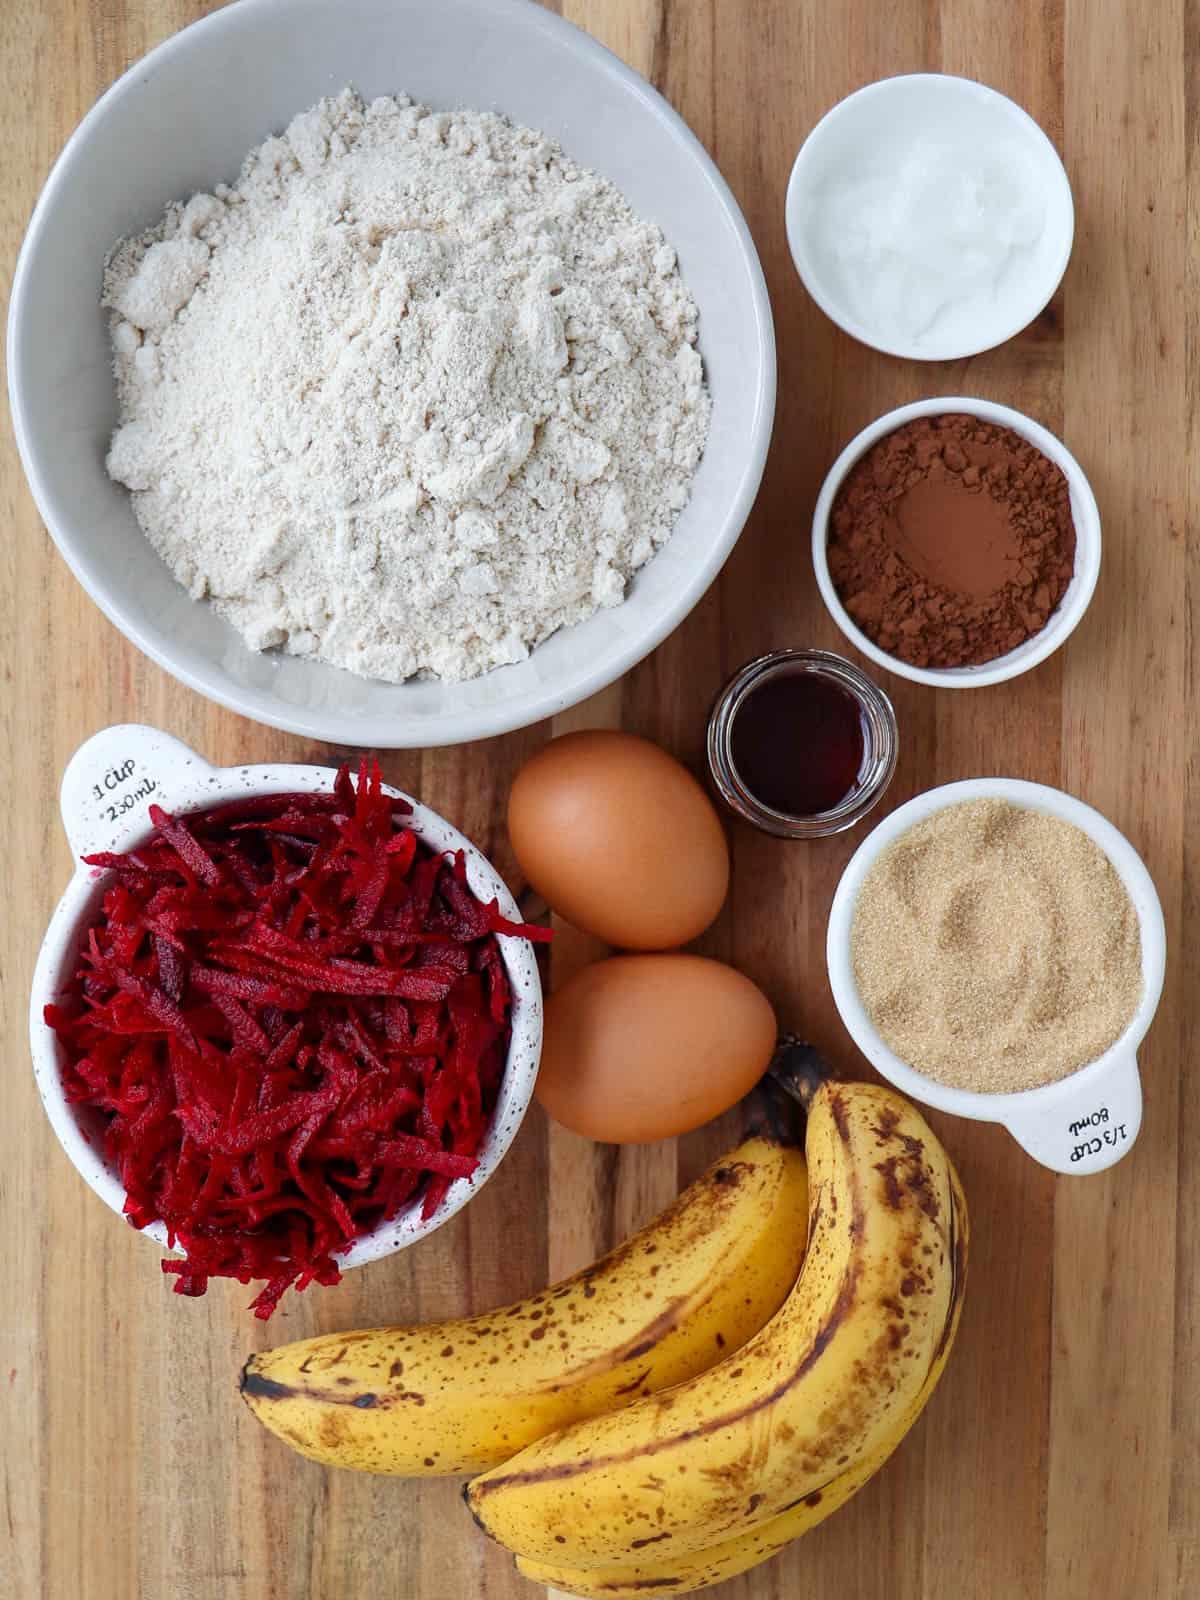 Red velvet cake ingredients on wooden board.